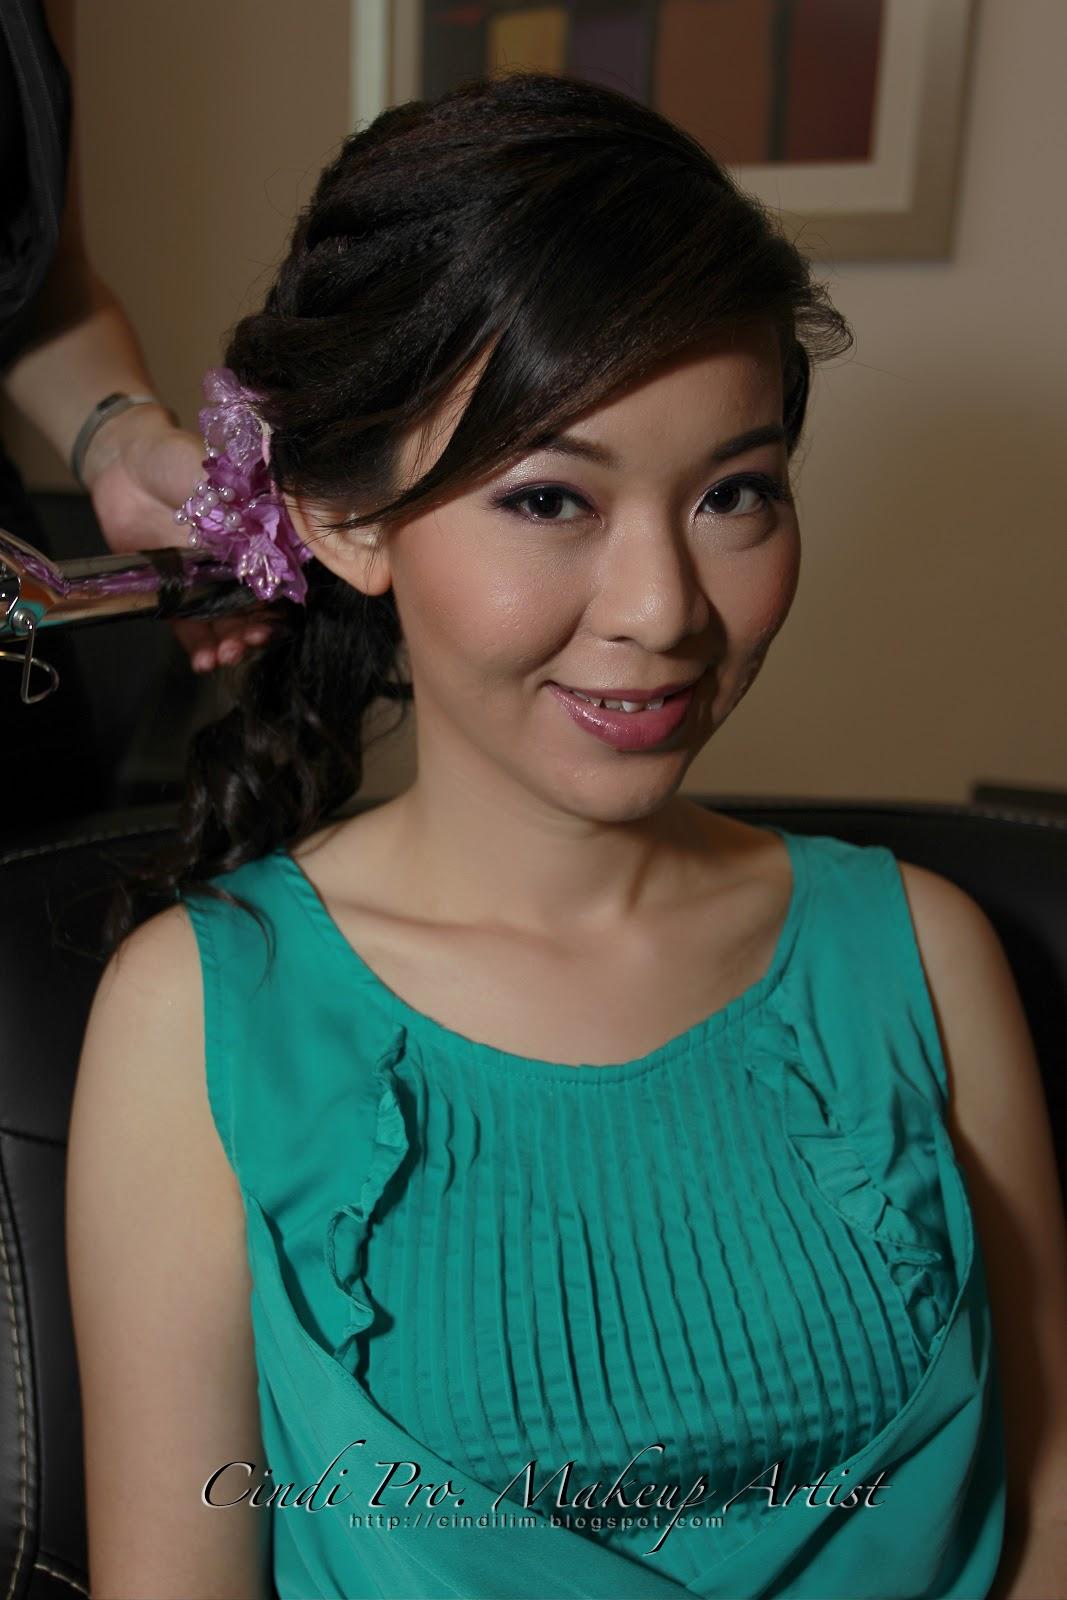 Cindi Pro Makeup Artist Commercial Photoshoot Makeup: :: Cindi Pro. Makeup Artist ::: Registration Of Marriage